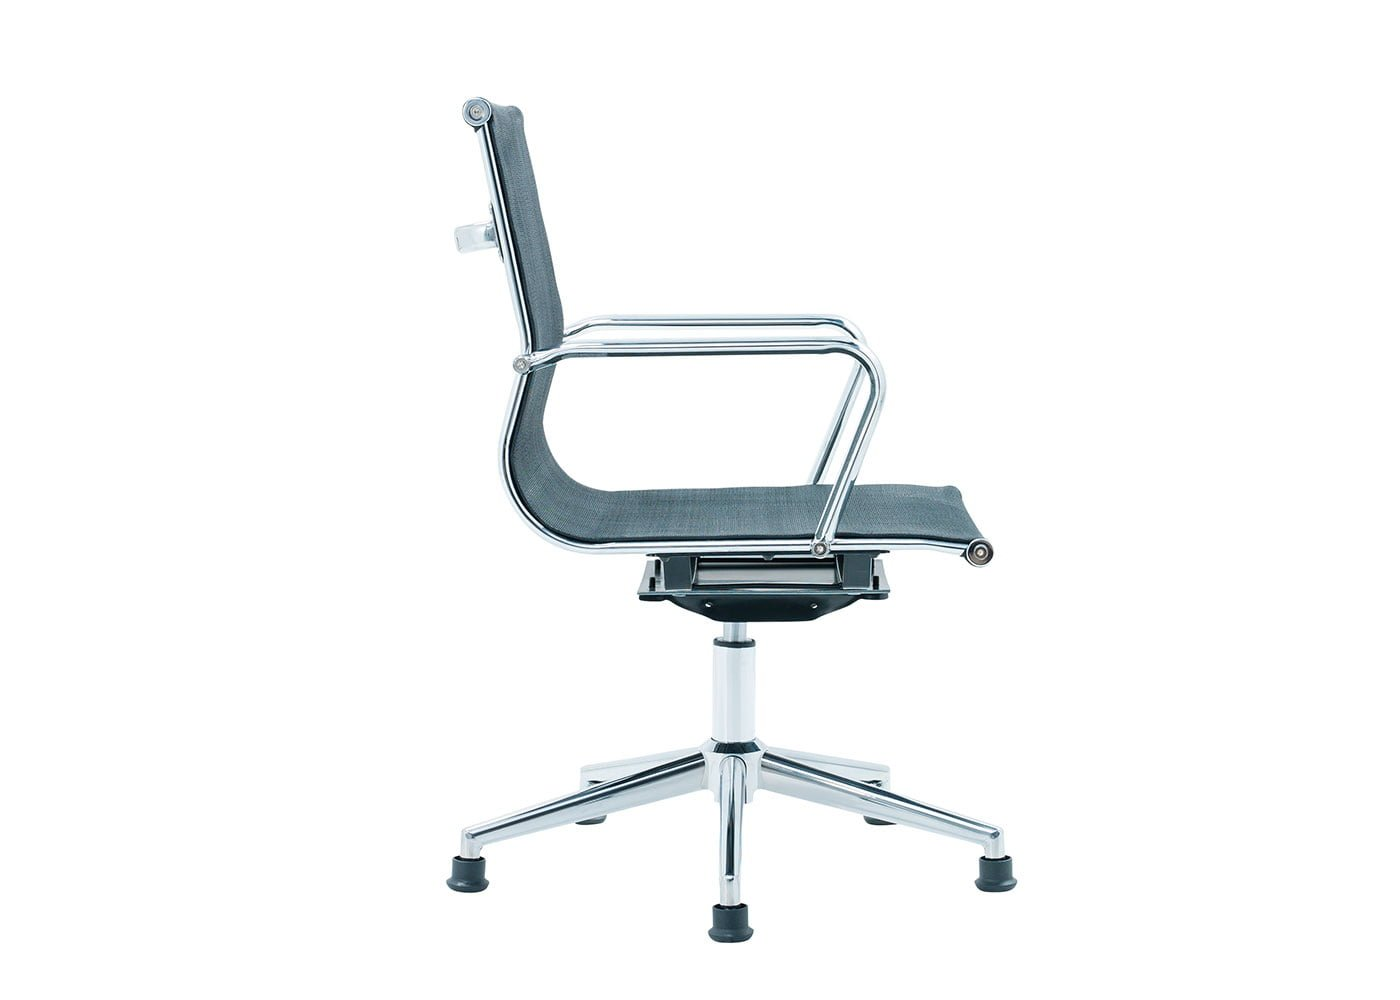 kristal-summer-ofis-koltuğu-ofis-mobilyasi-bursa-3